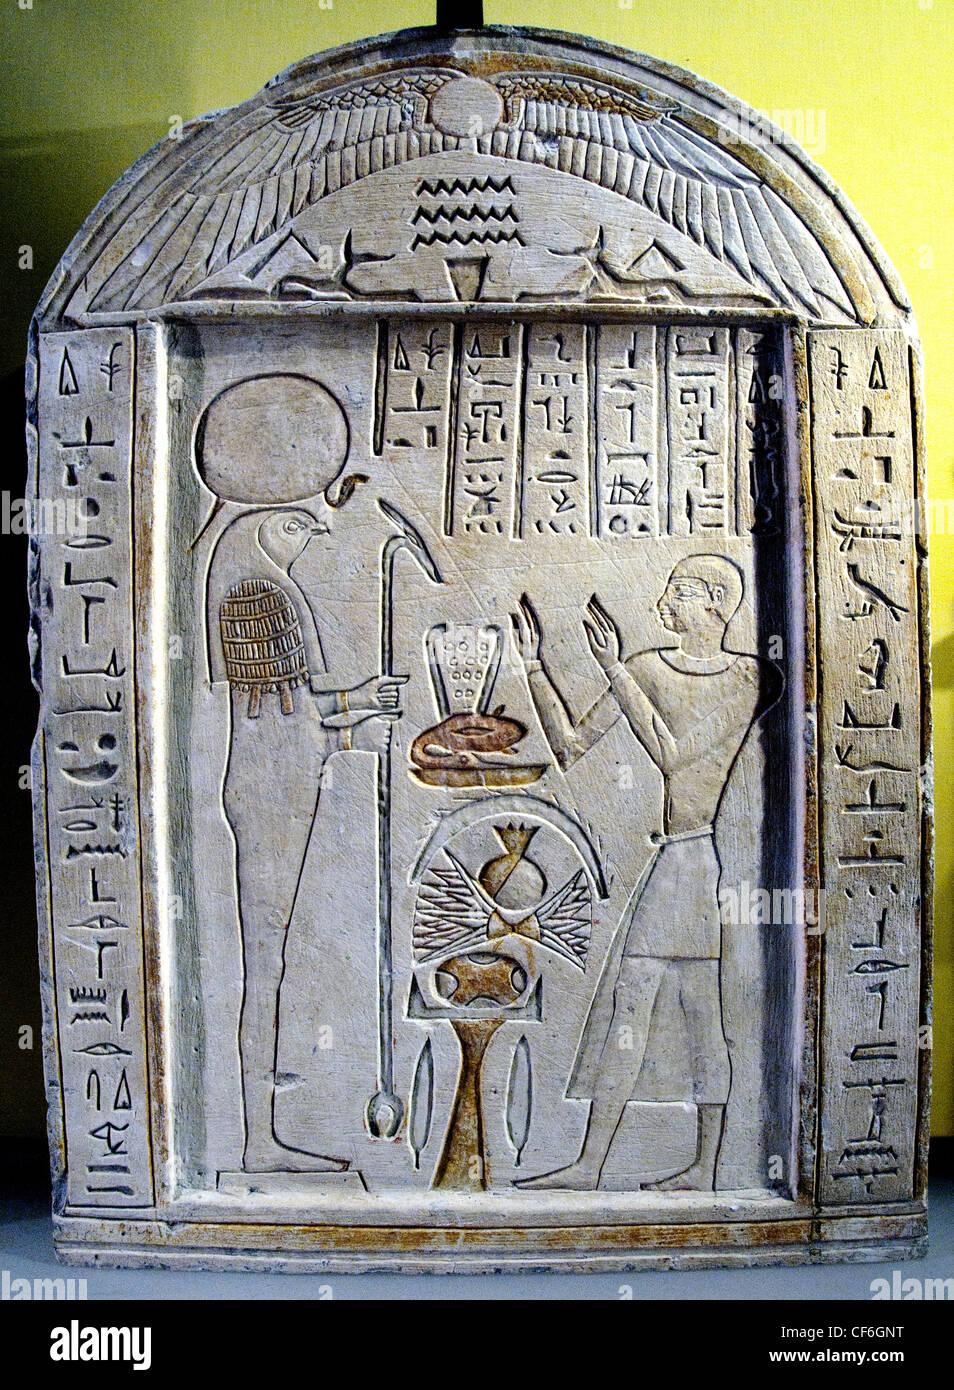 Amenirdis higher Weavers temple of Osiris worship the sun Atum Re to 650 BC 26 Dynasty Egypt Egyptian hieroglyph - Stock Image